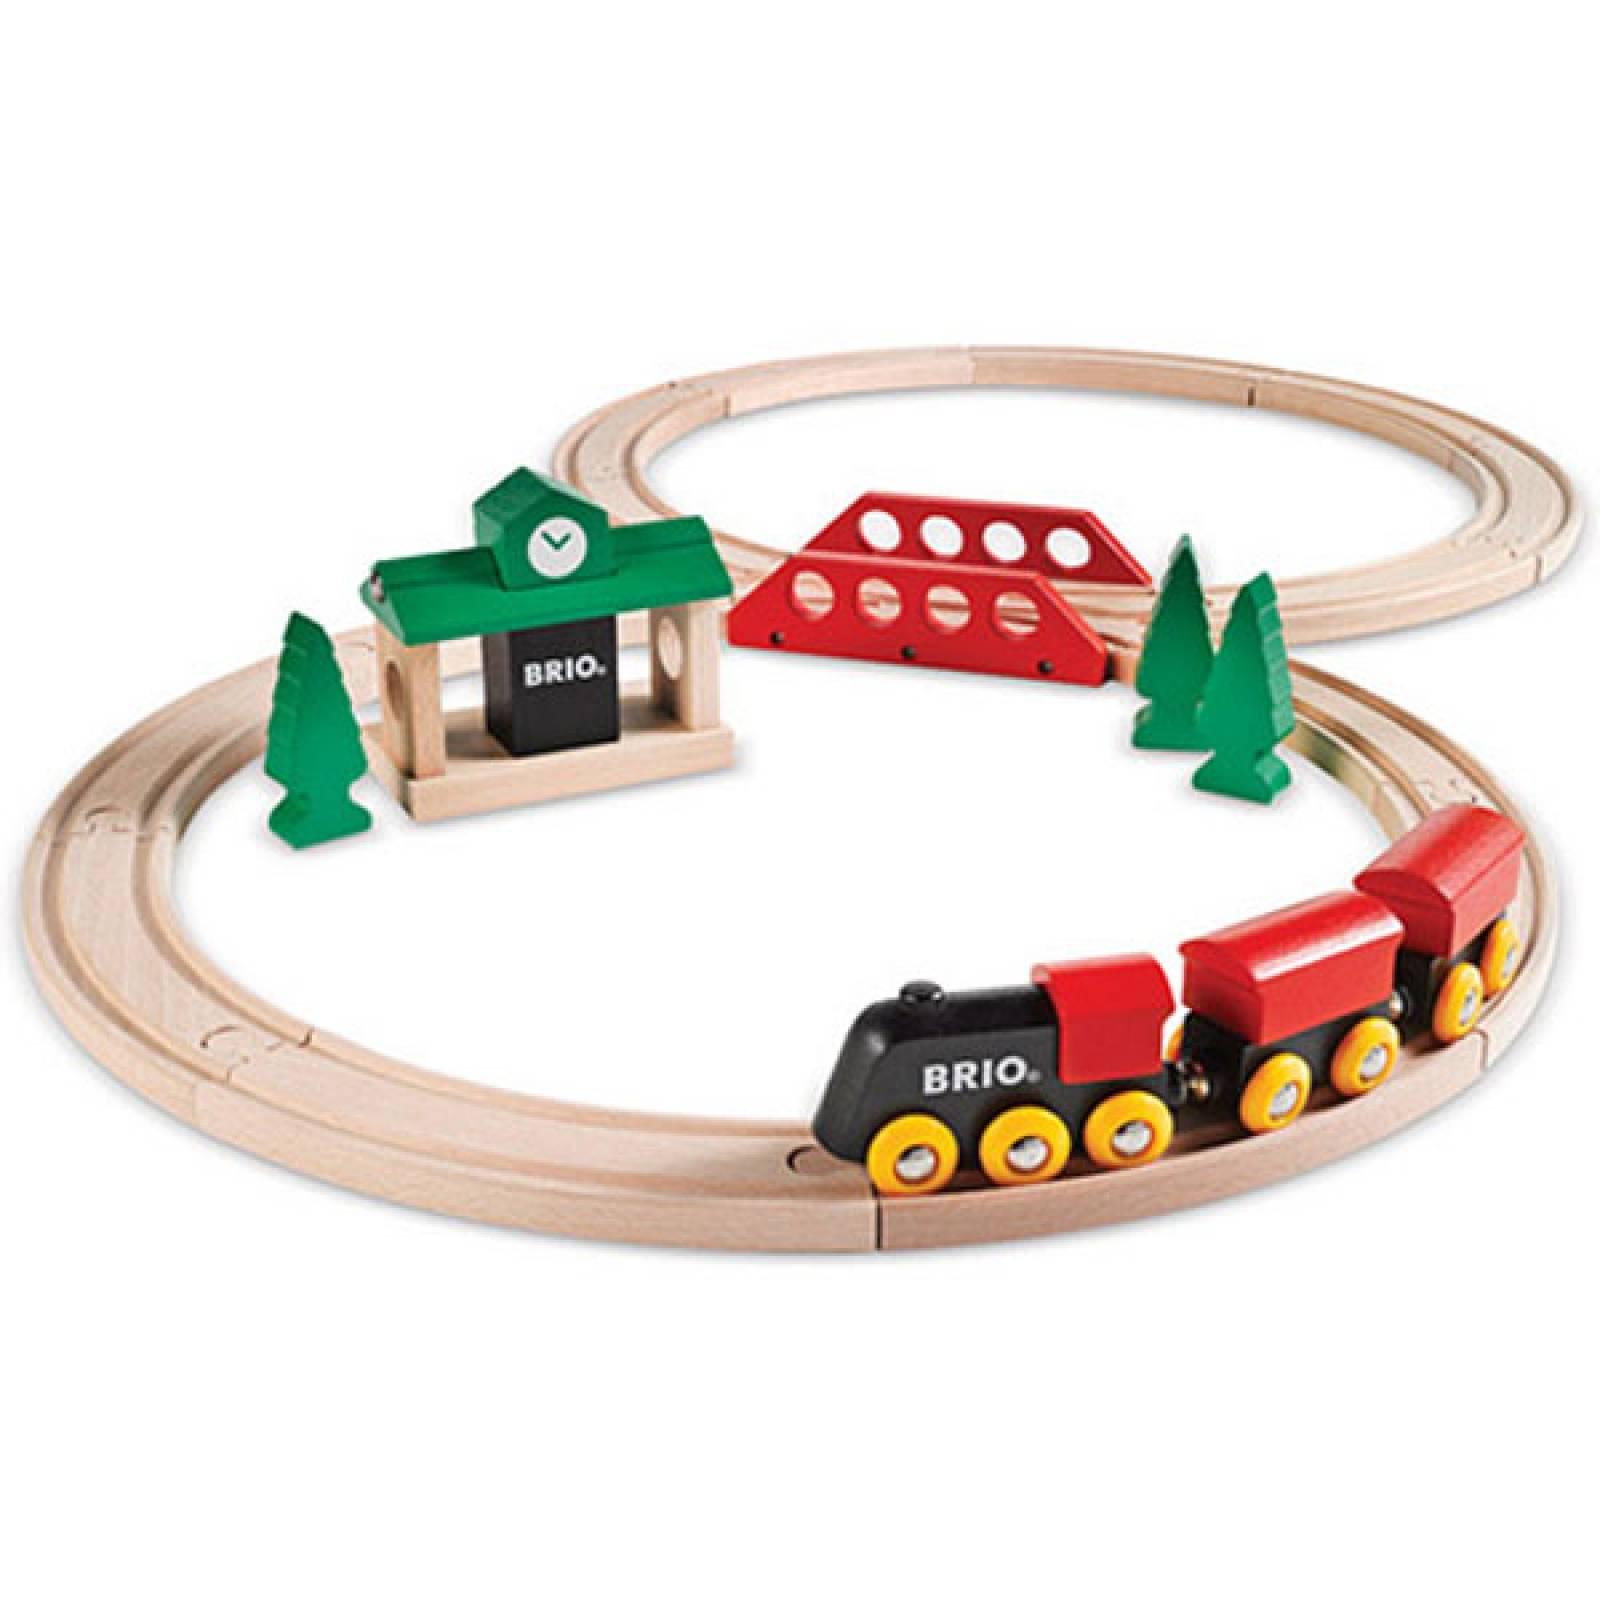 Classic Figure of 8 Set BRIO Wooden Railway 3+